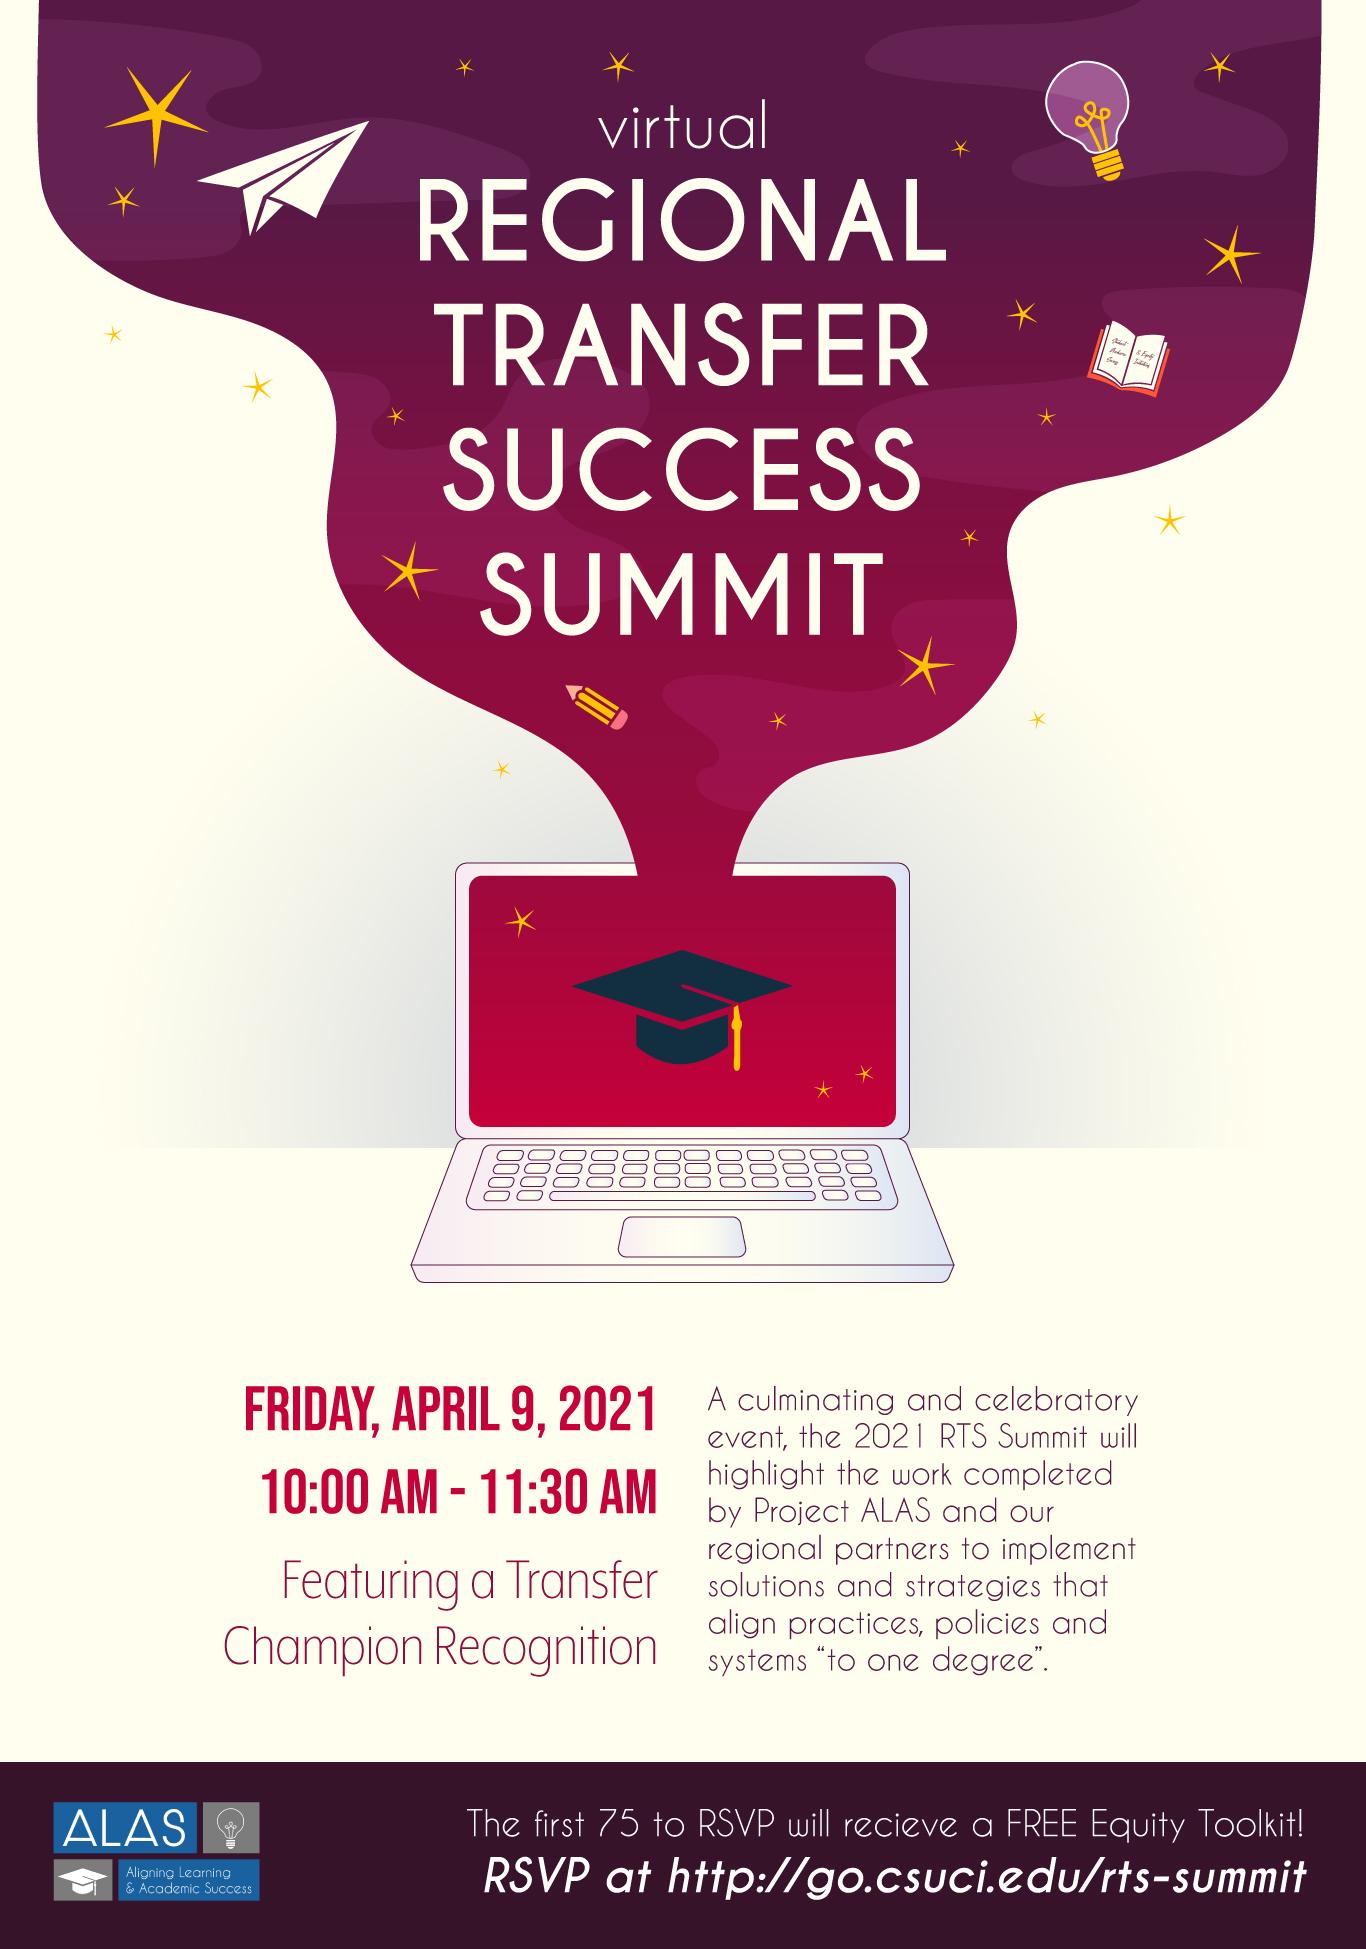 2020 Regional Transfer Success Summit Flyer